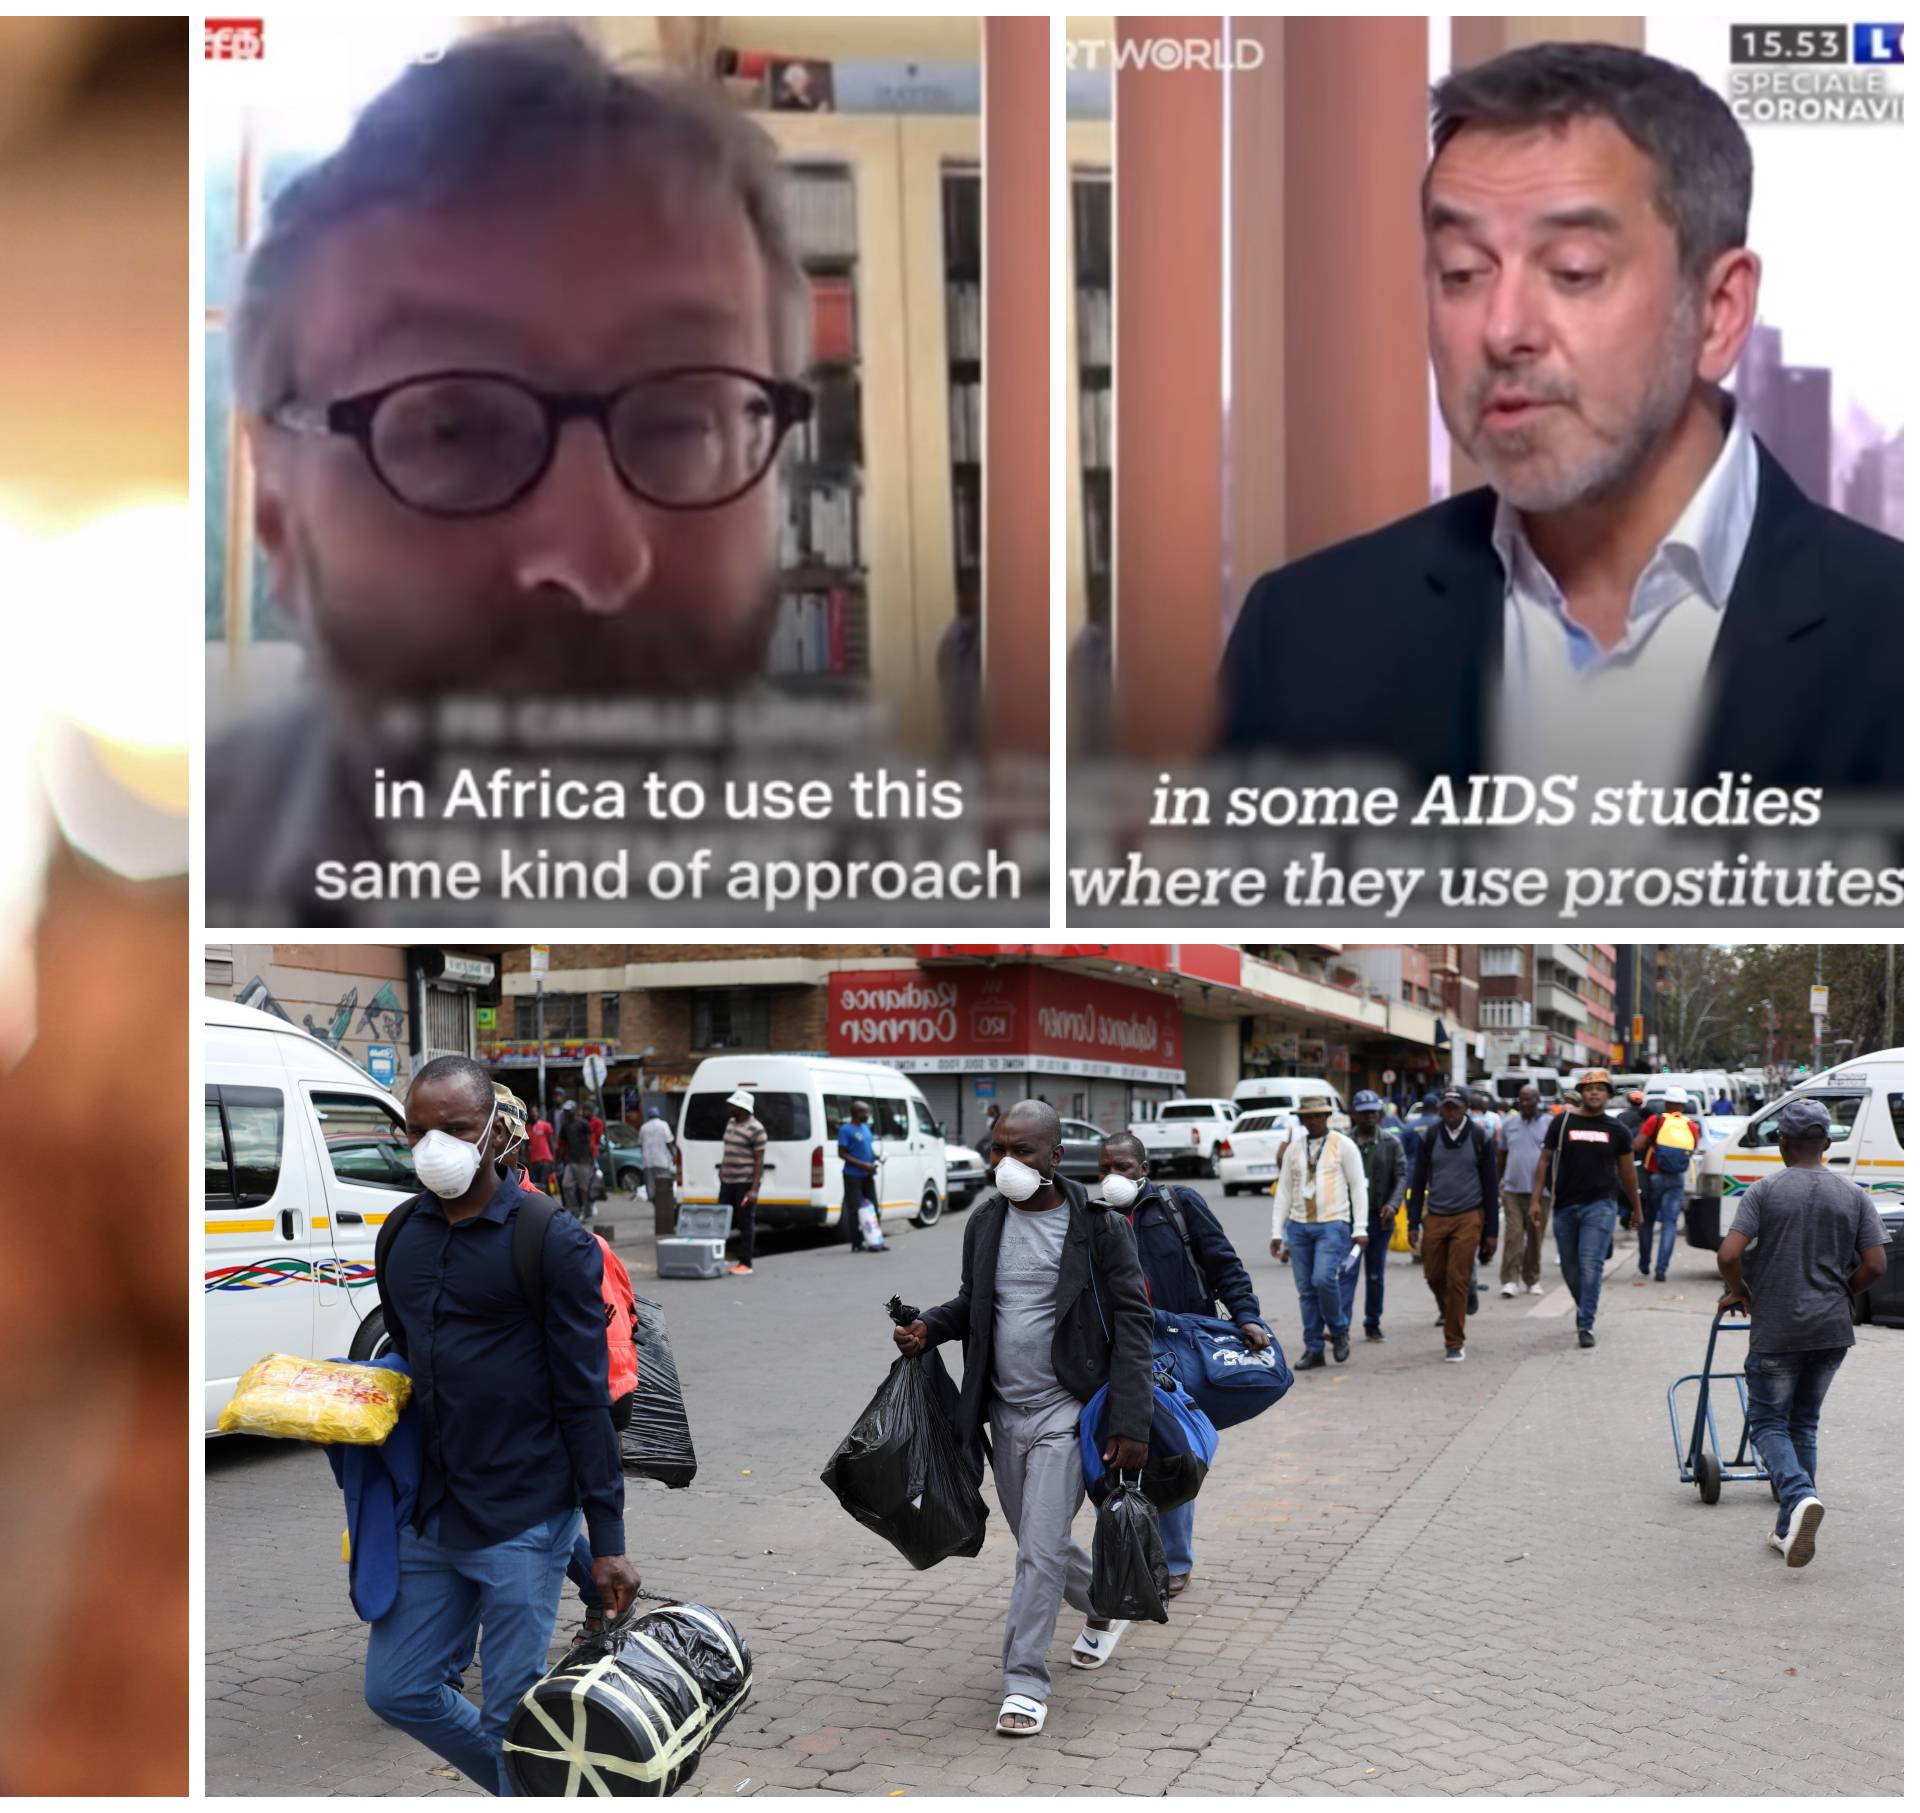 Afrikanci kao zamorci: 'Kao s prostitutkama u doba AIDS-a'